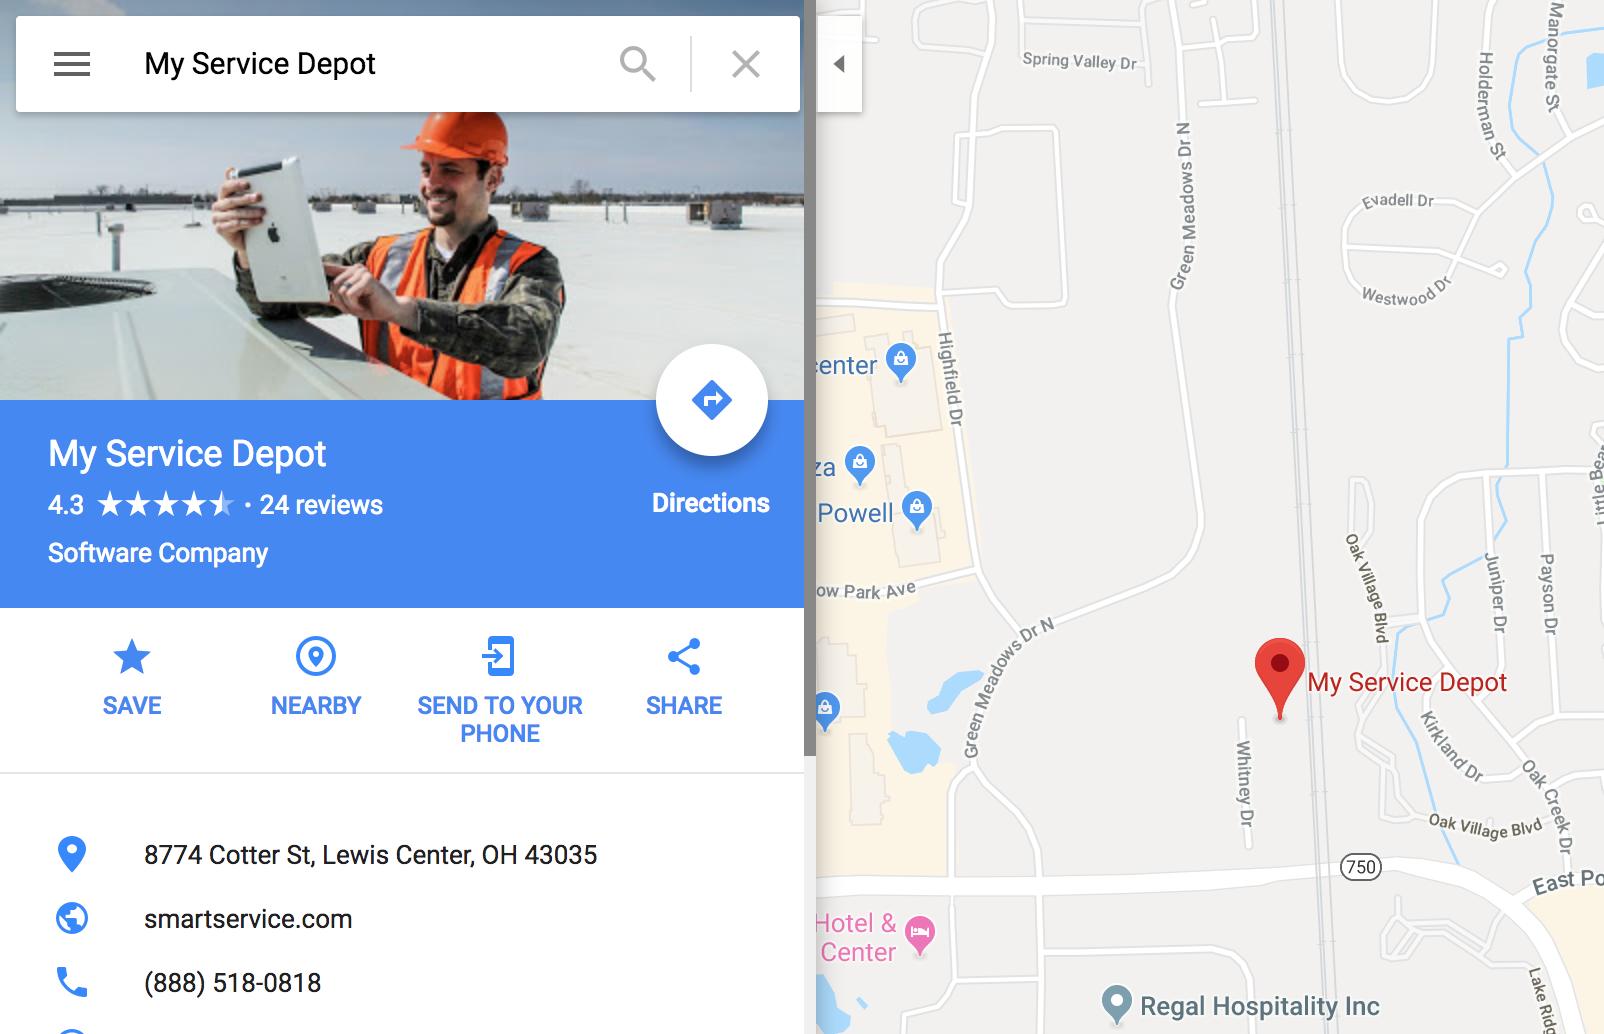 Smart Service Google My Business Page